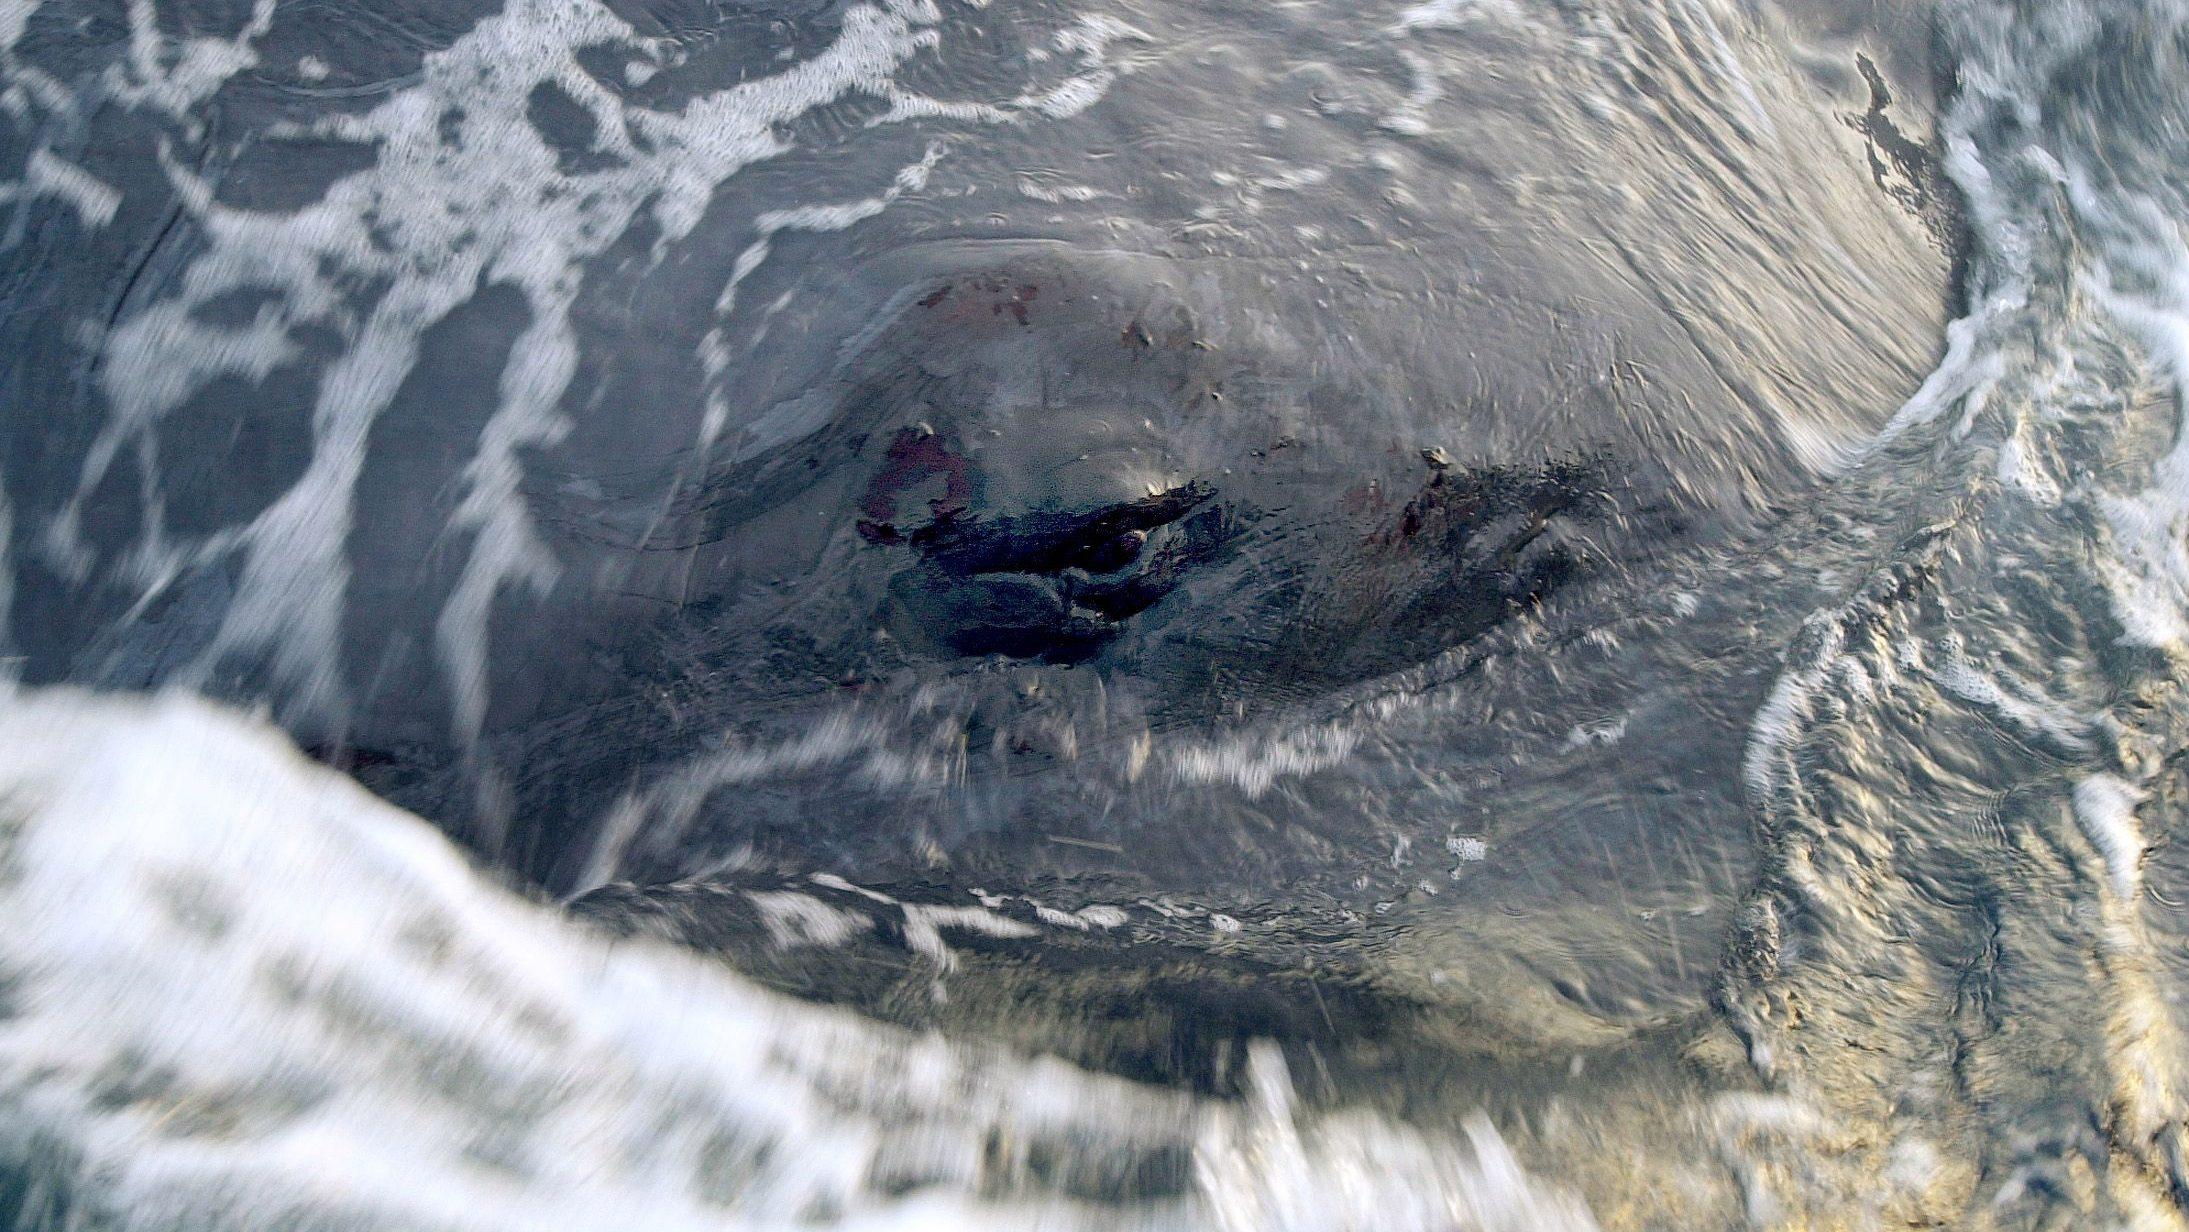 Eye of a sperm whale.